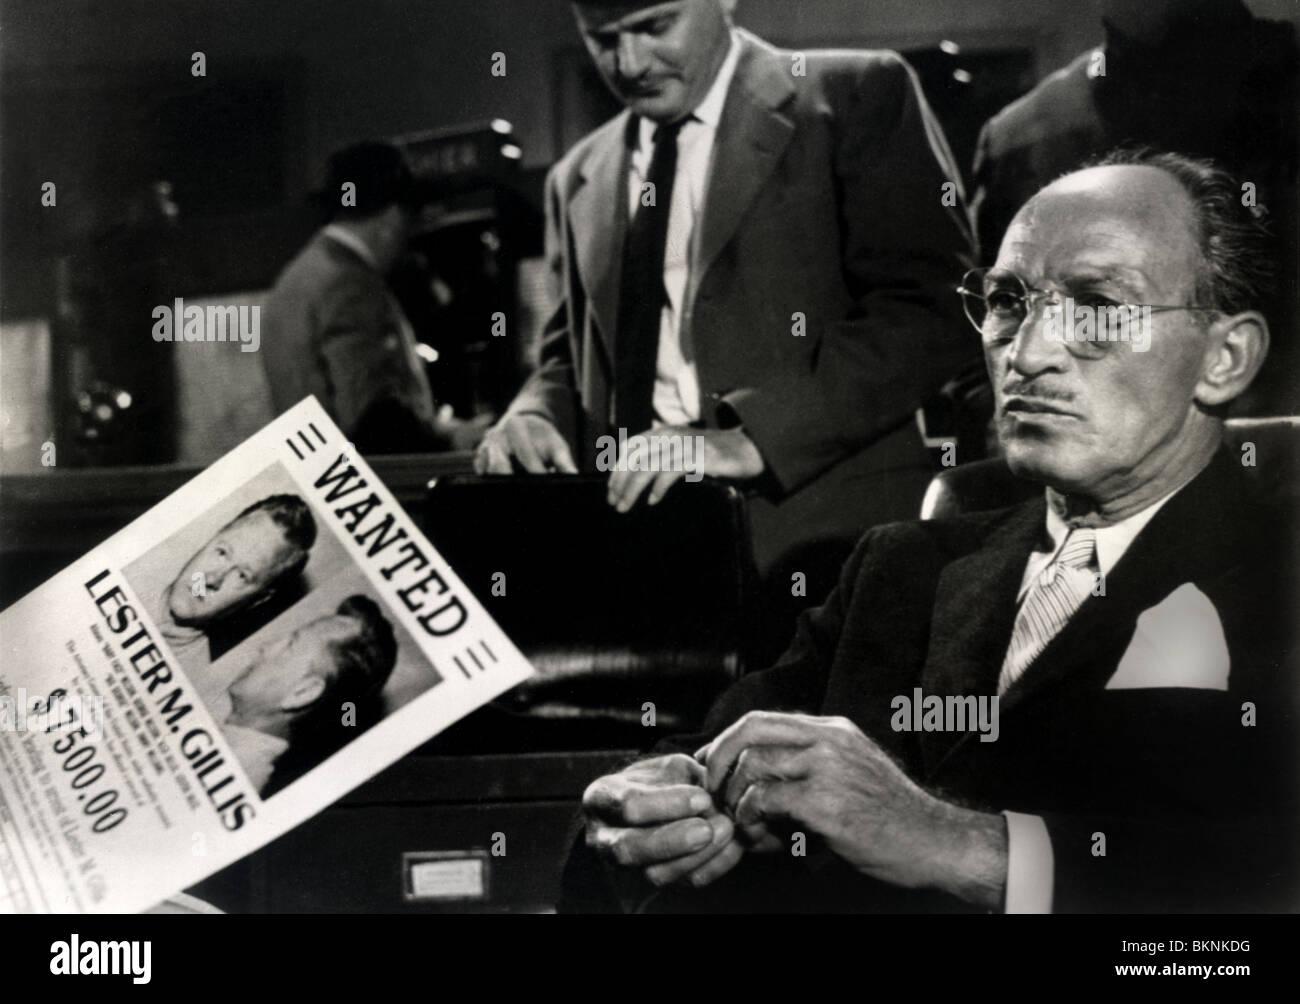 BABY FACE NELSON (1957) SIR CEDRIC HARDWICKE DON SIEGEL (DIR) BYFN 001FOH - Stock Image